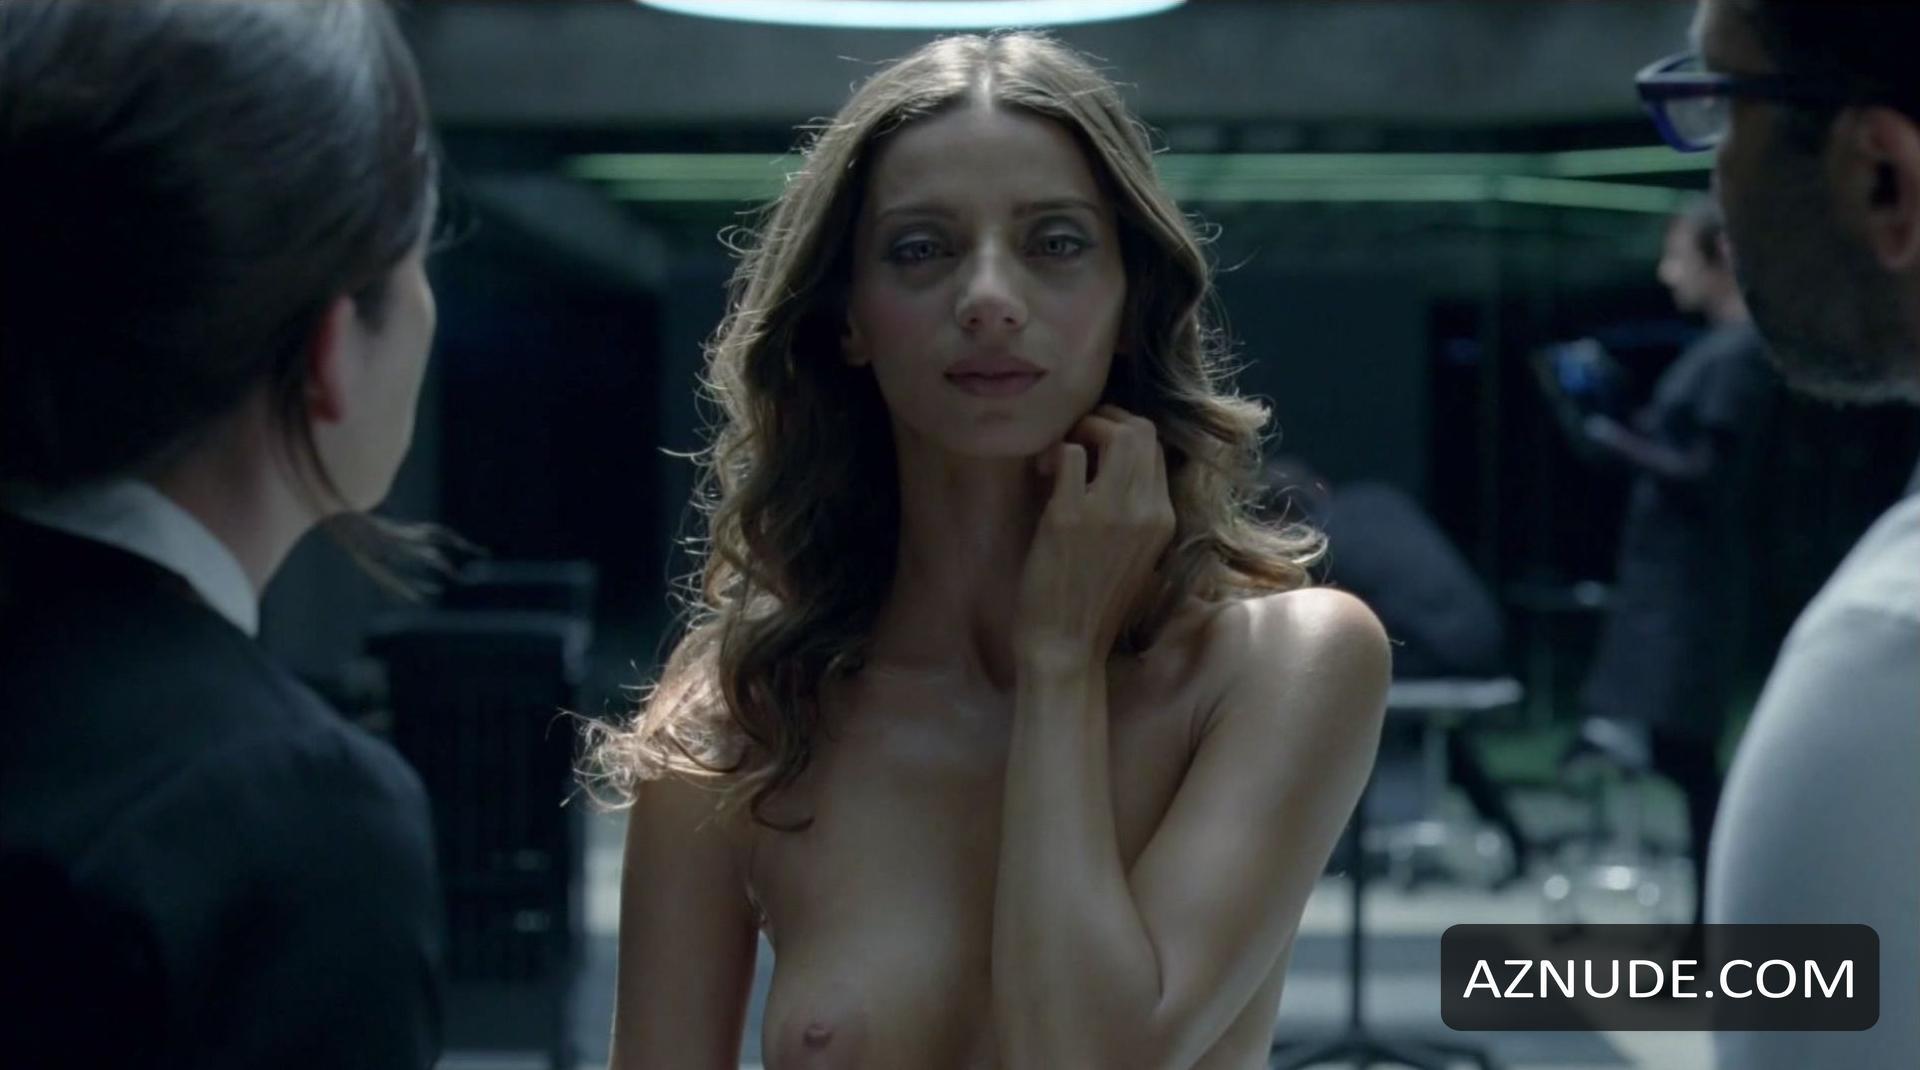 Boobs Angela Sarafyan nude photos 2019